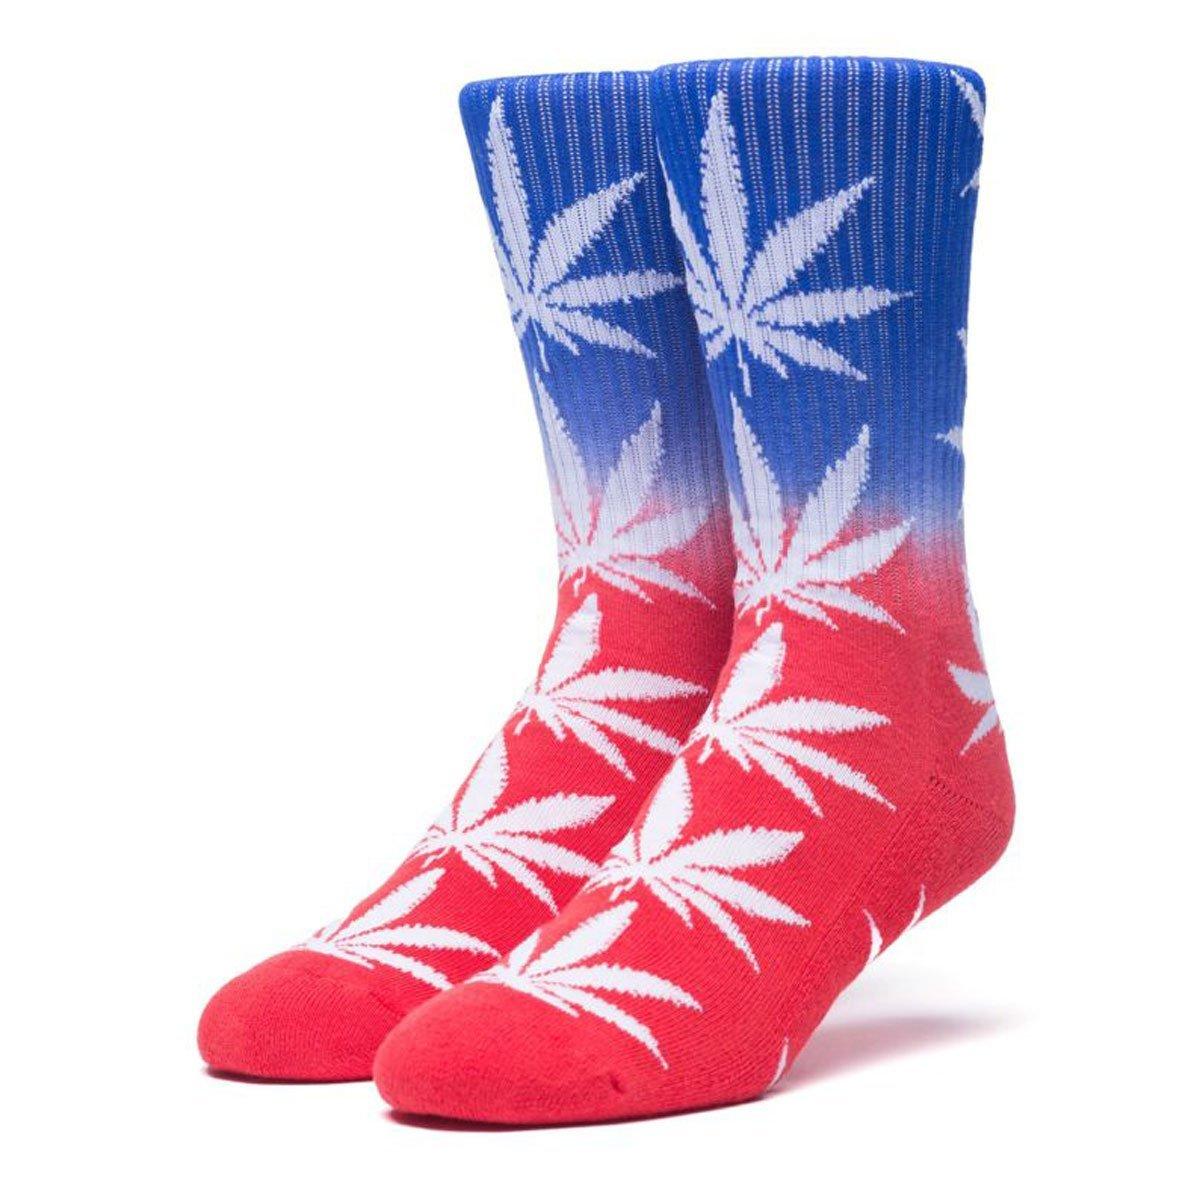 Huf Plantlife USA Socks - Red